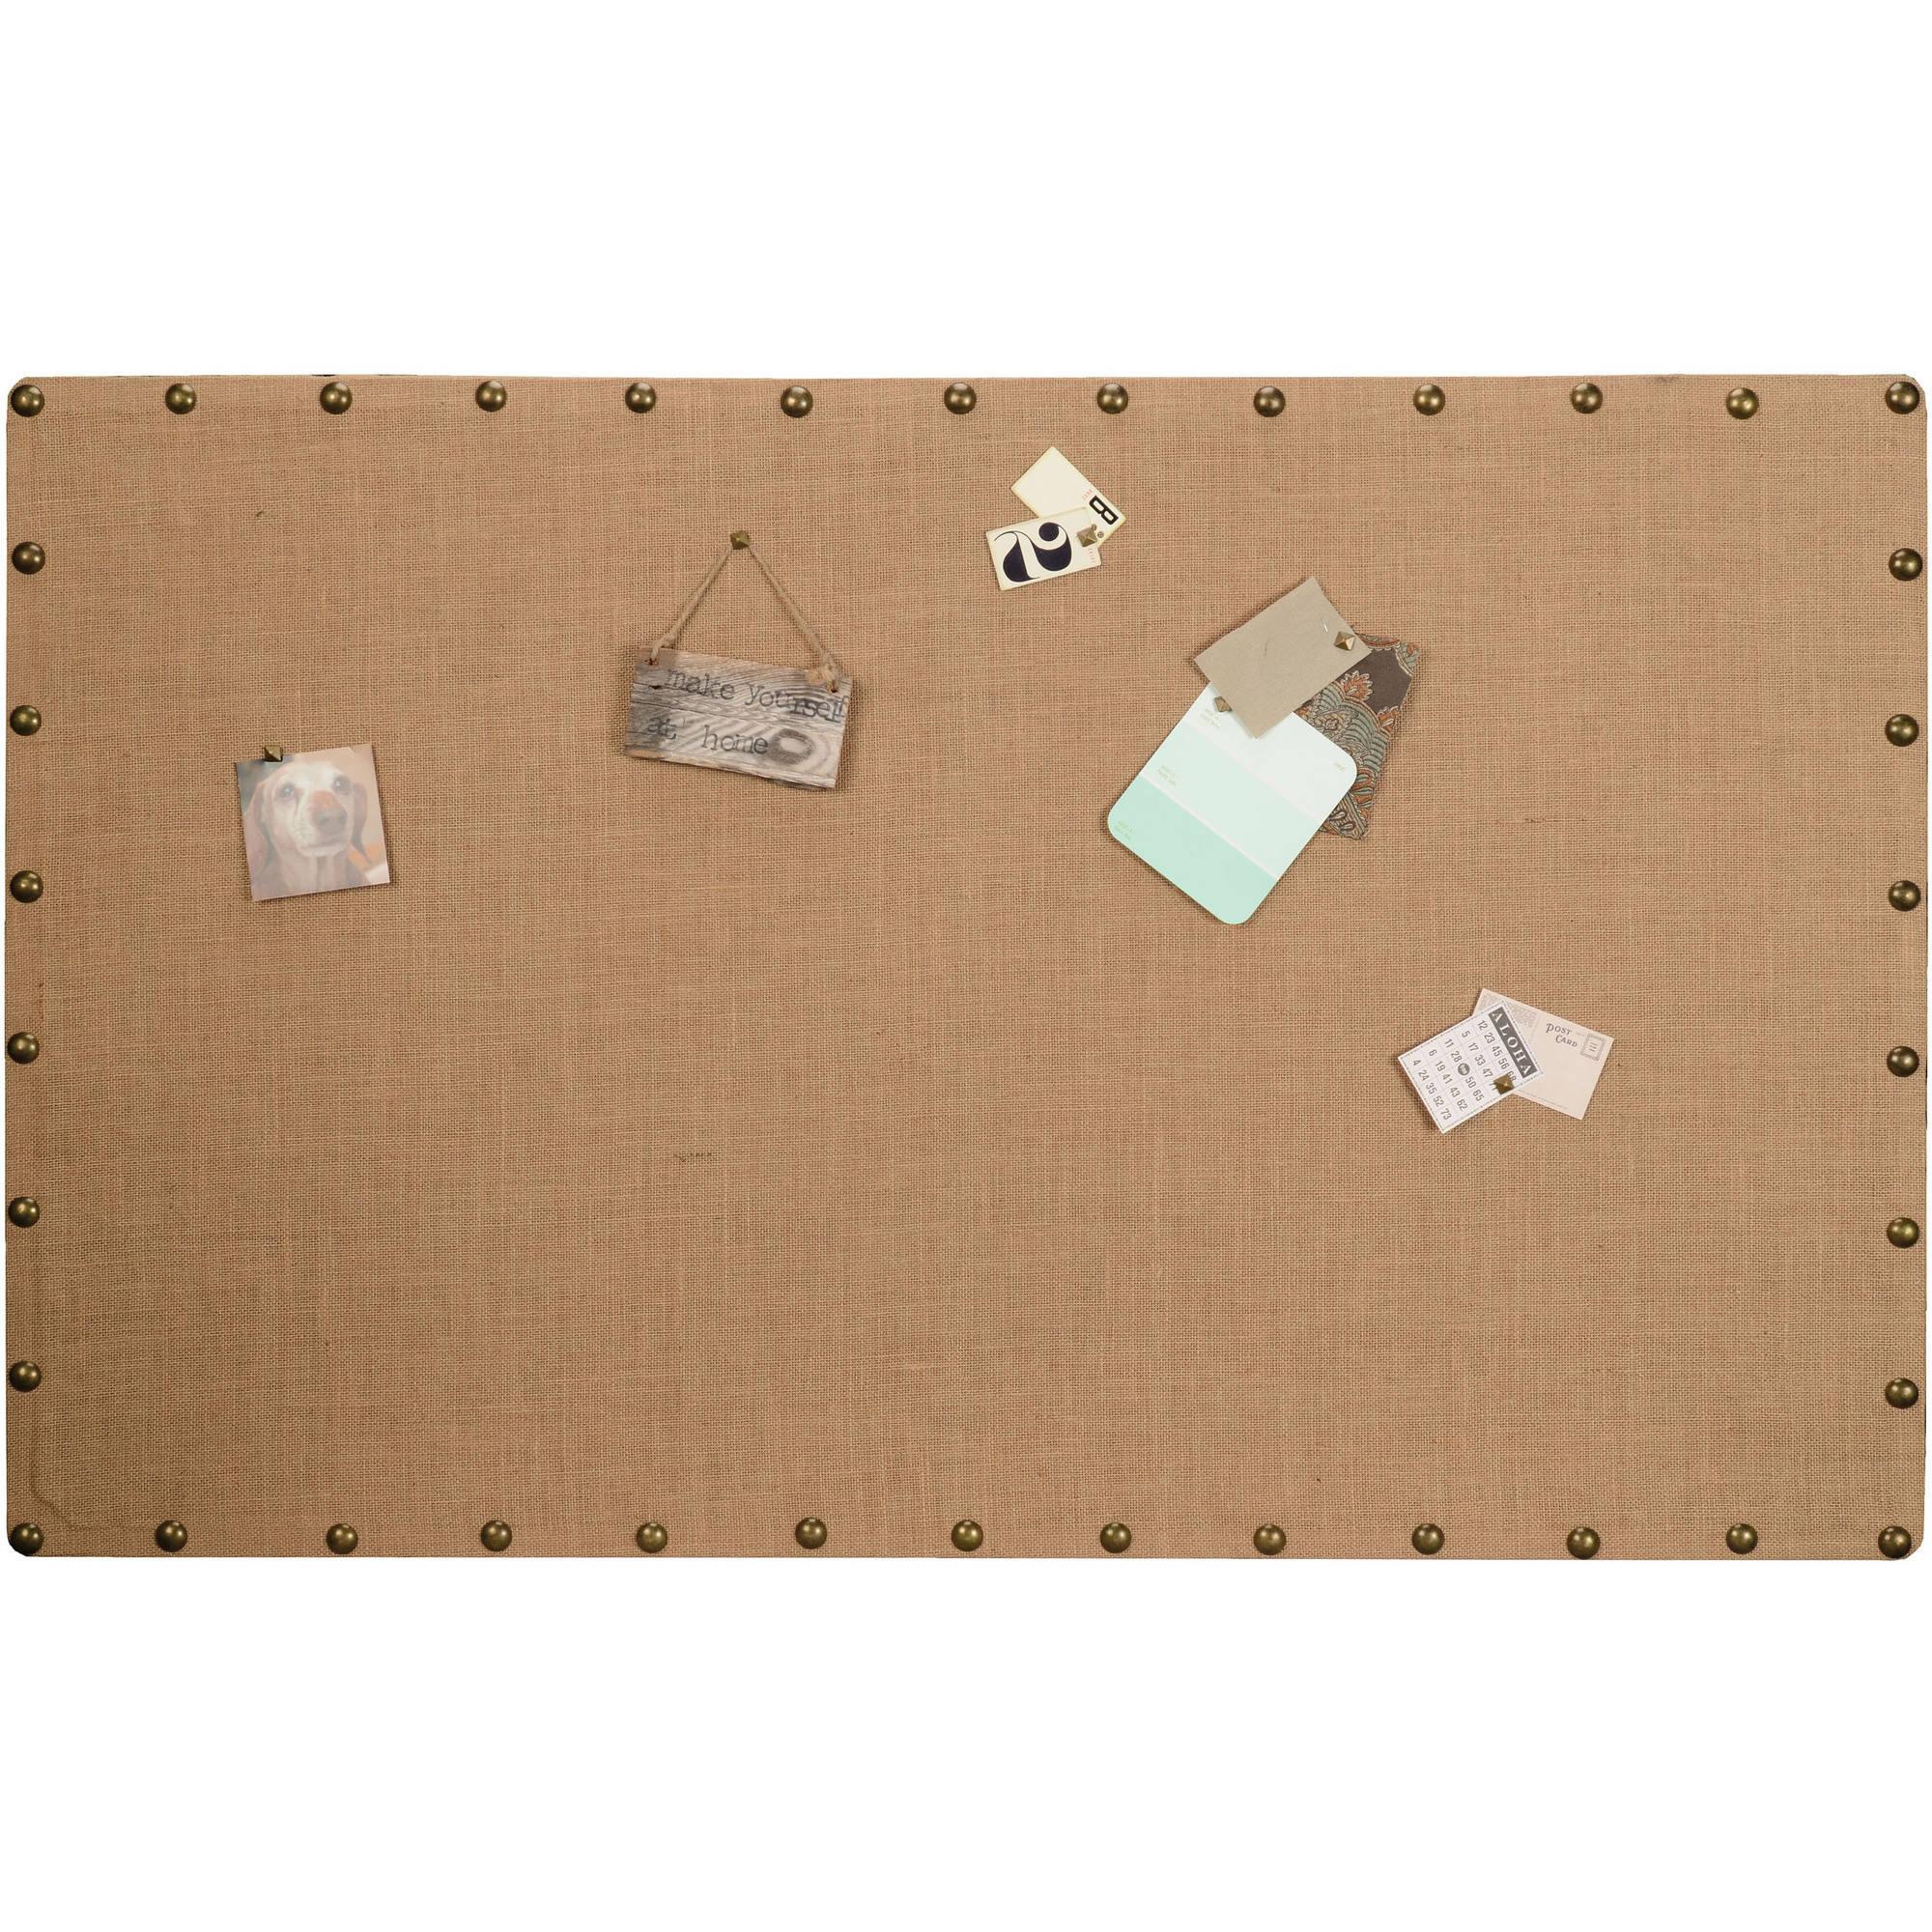 Linon Burlap Nailhead Corkboard, Large Size, Assembled